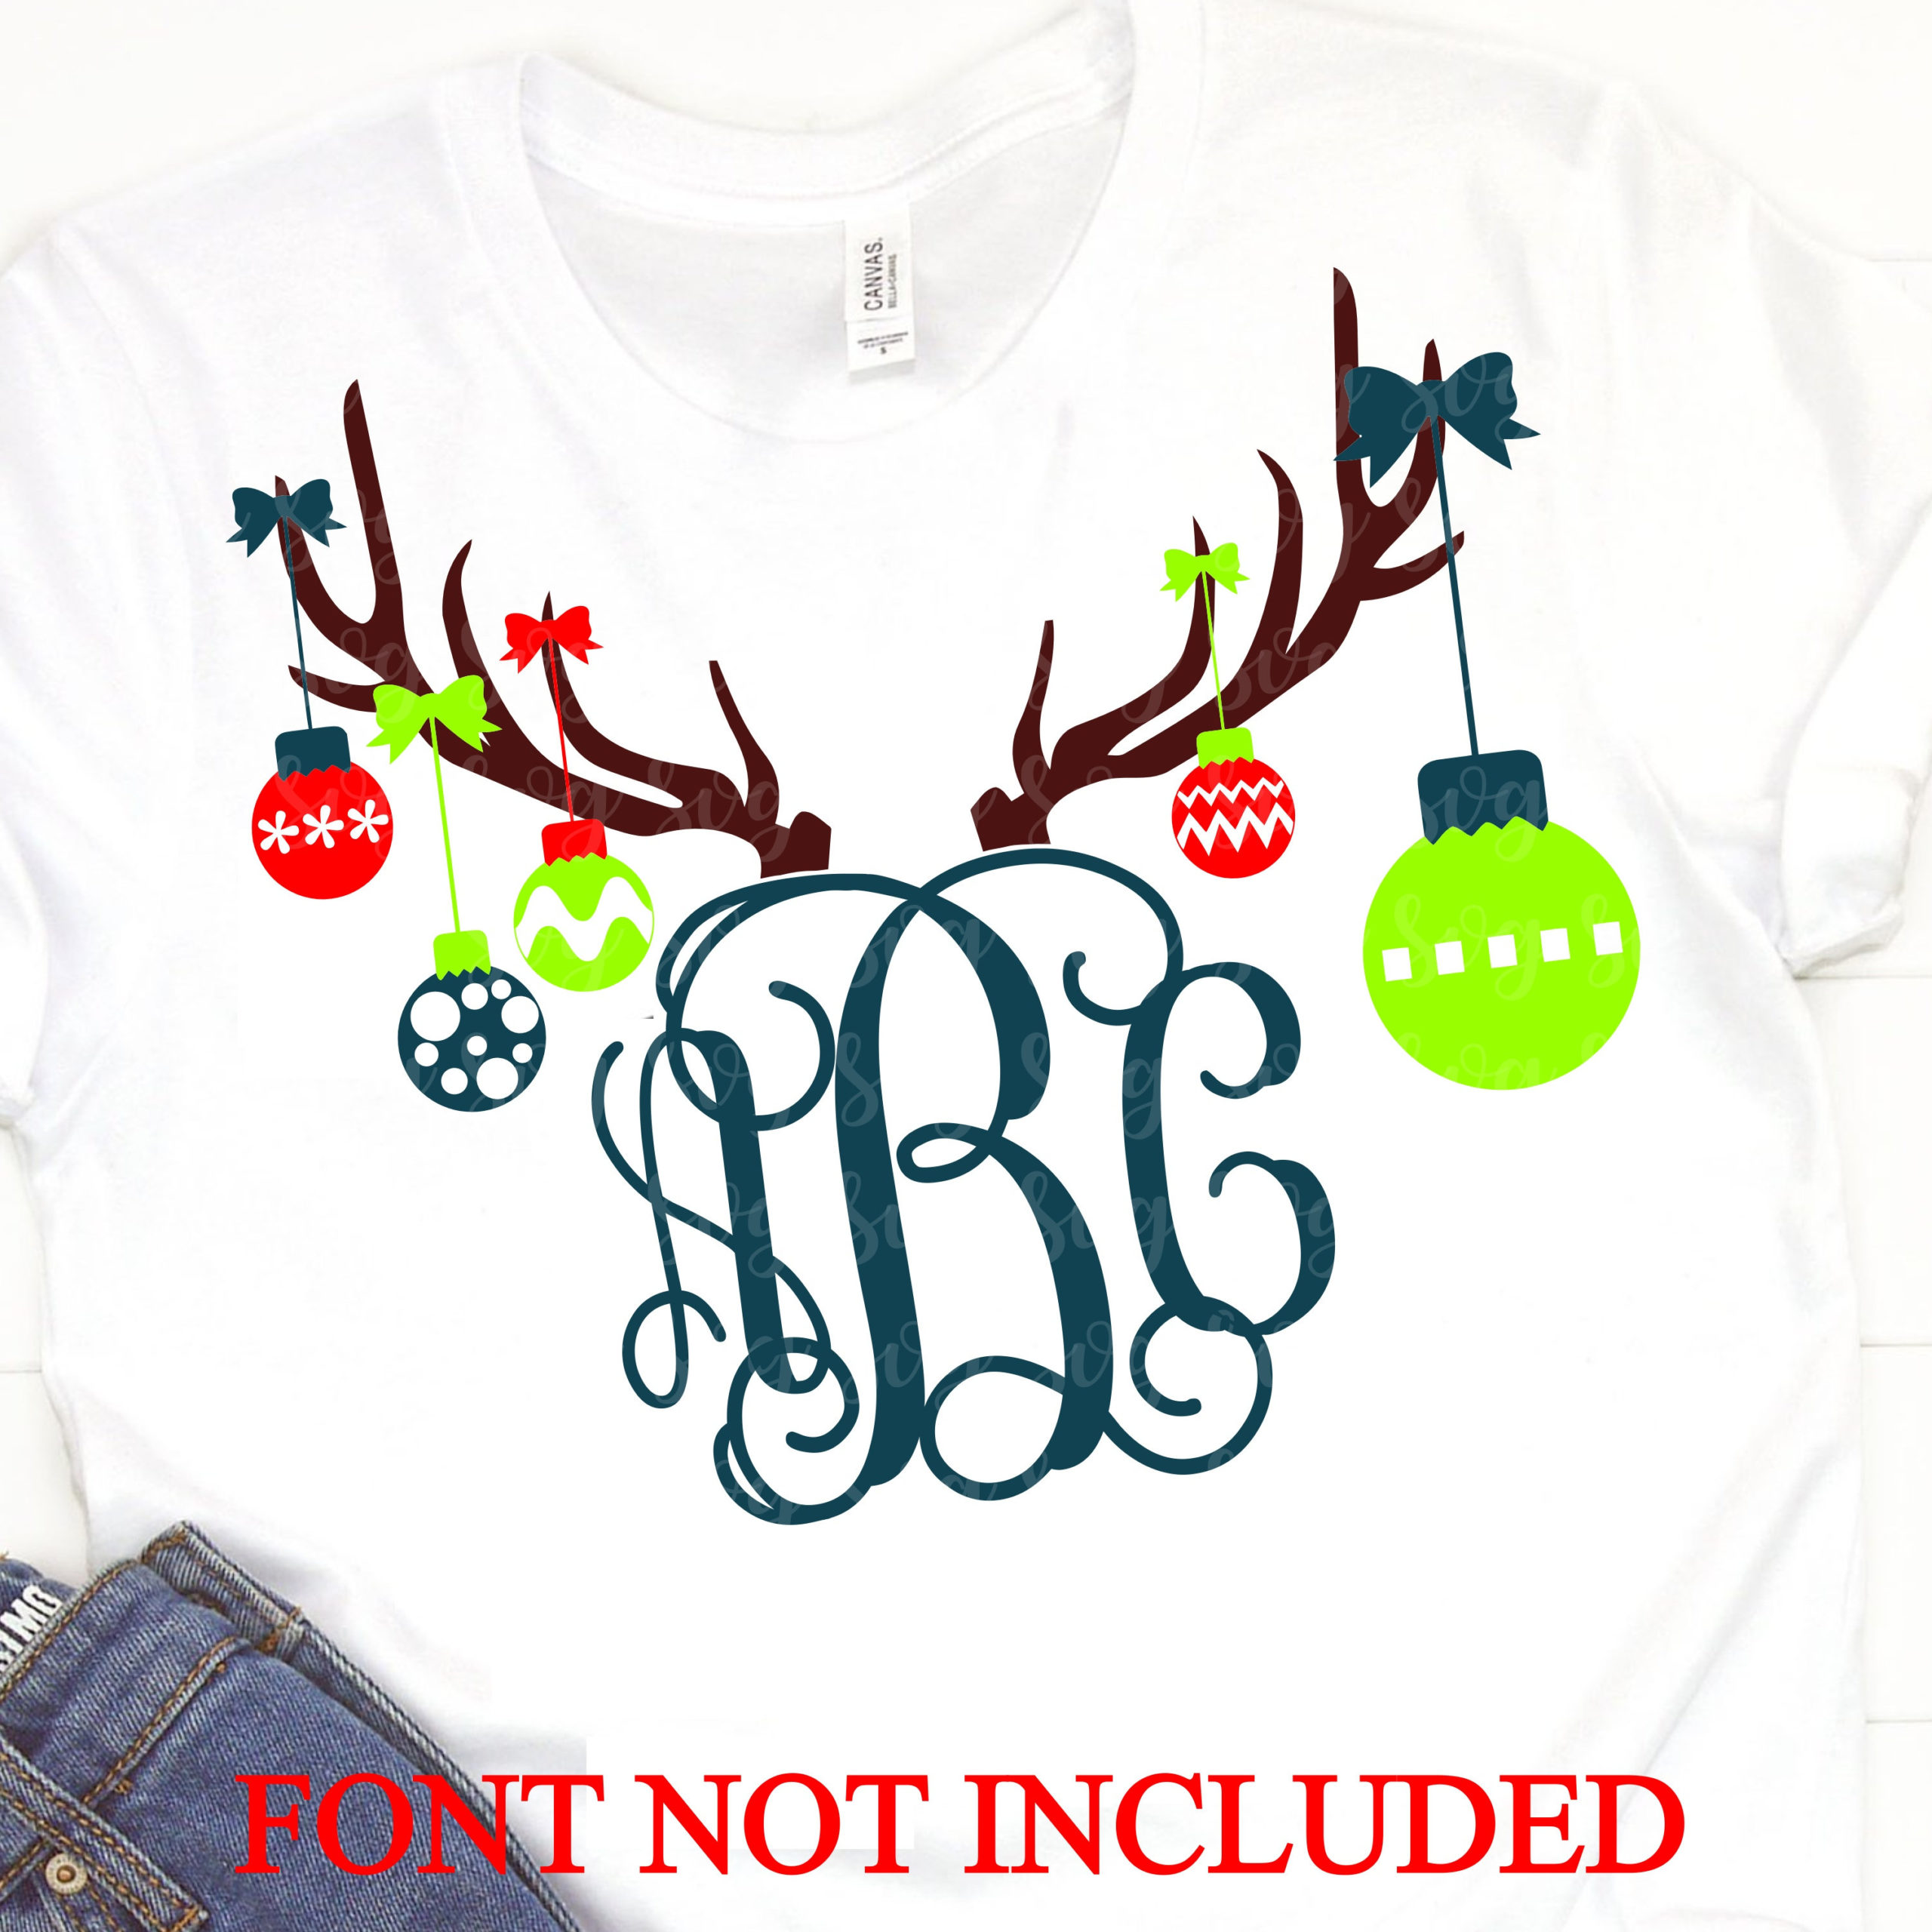 Reindeer-monogramchristmas-svgholiday-svgschristmas-svgs-holiday-svg-christmas-monogramchristmascricut-designssilhouette-designs-5e221af6